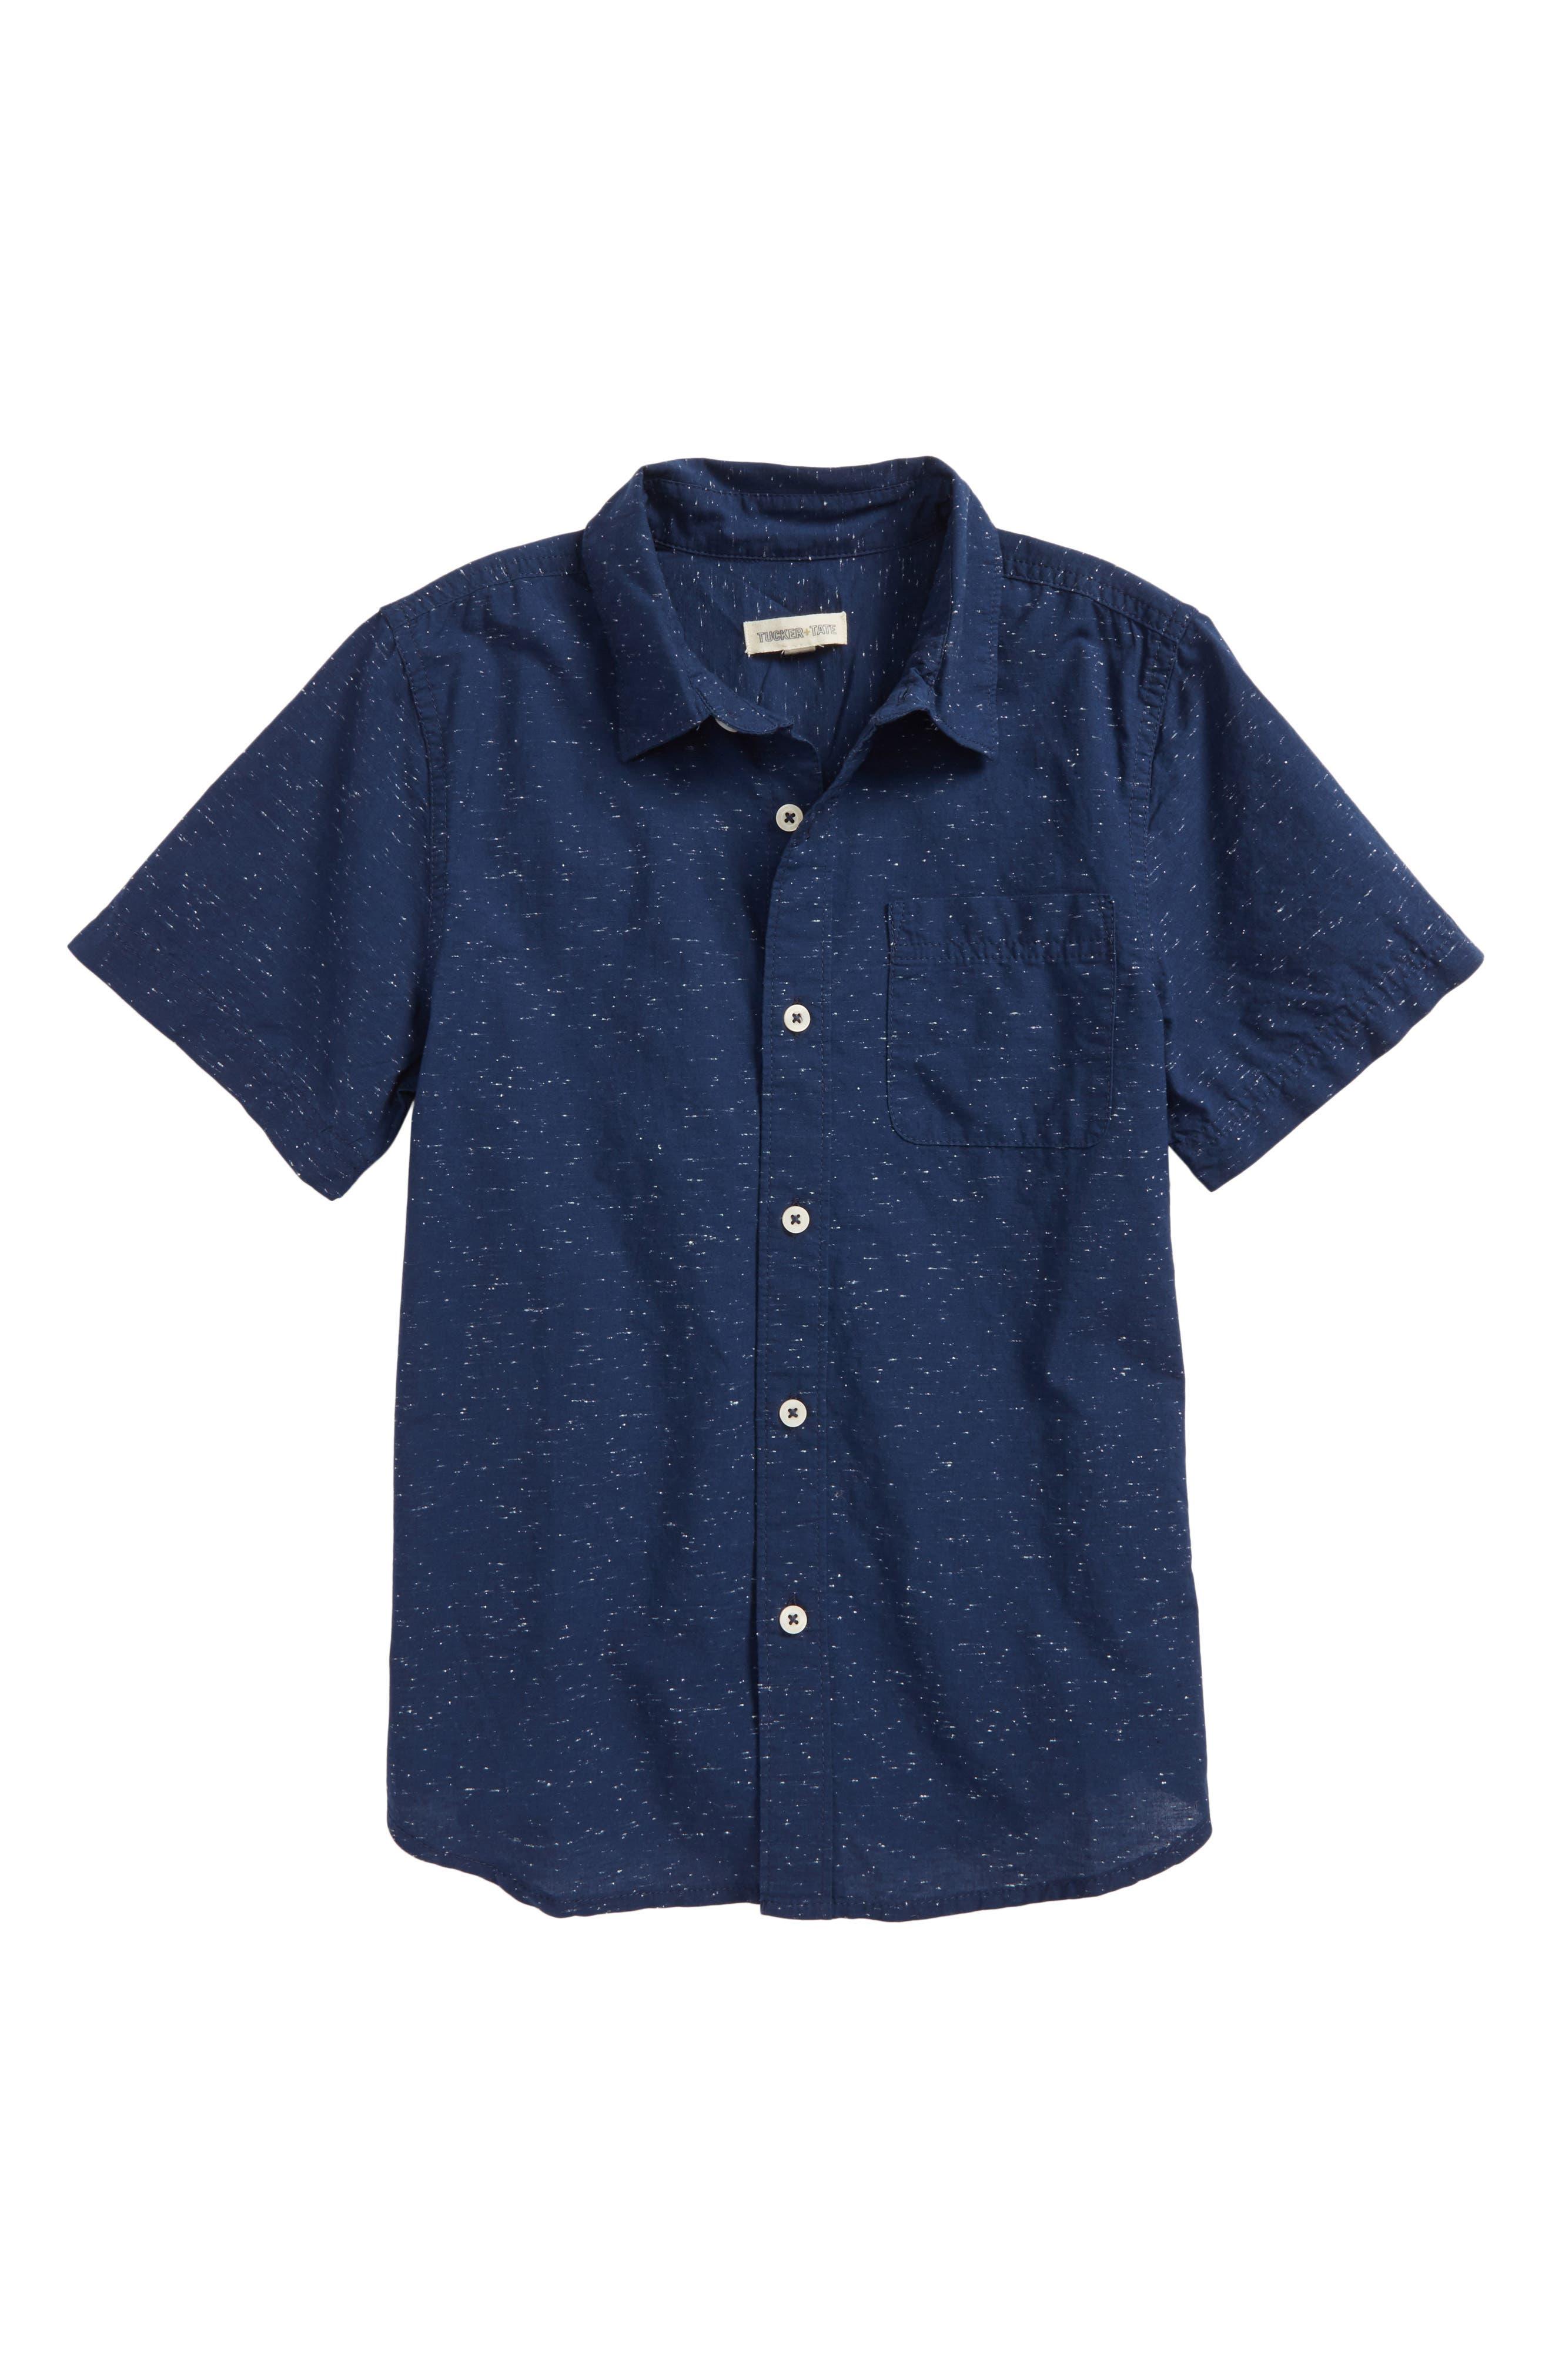 Slub Woven Shirt,                         Main,                         color, Navy Denim